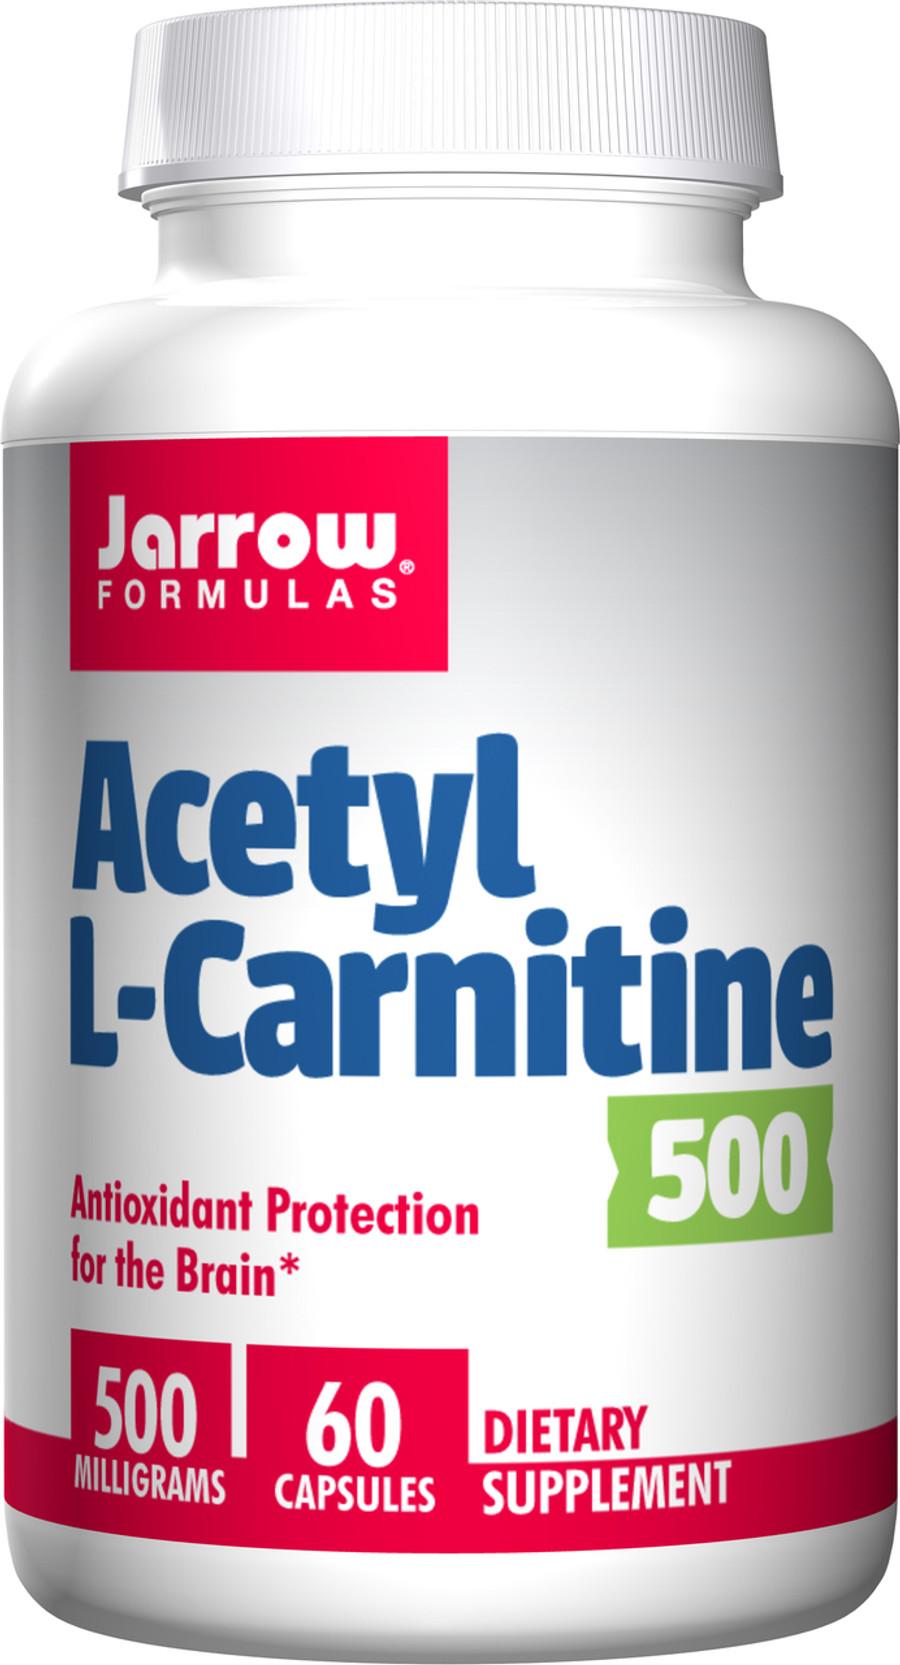 Acetyl L-Carnitine 500, 60 vcaps